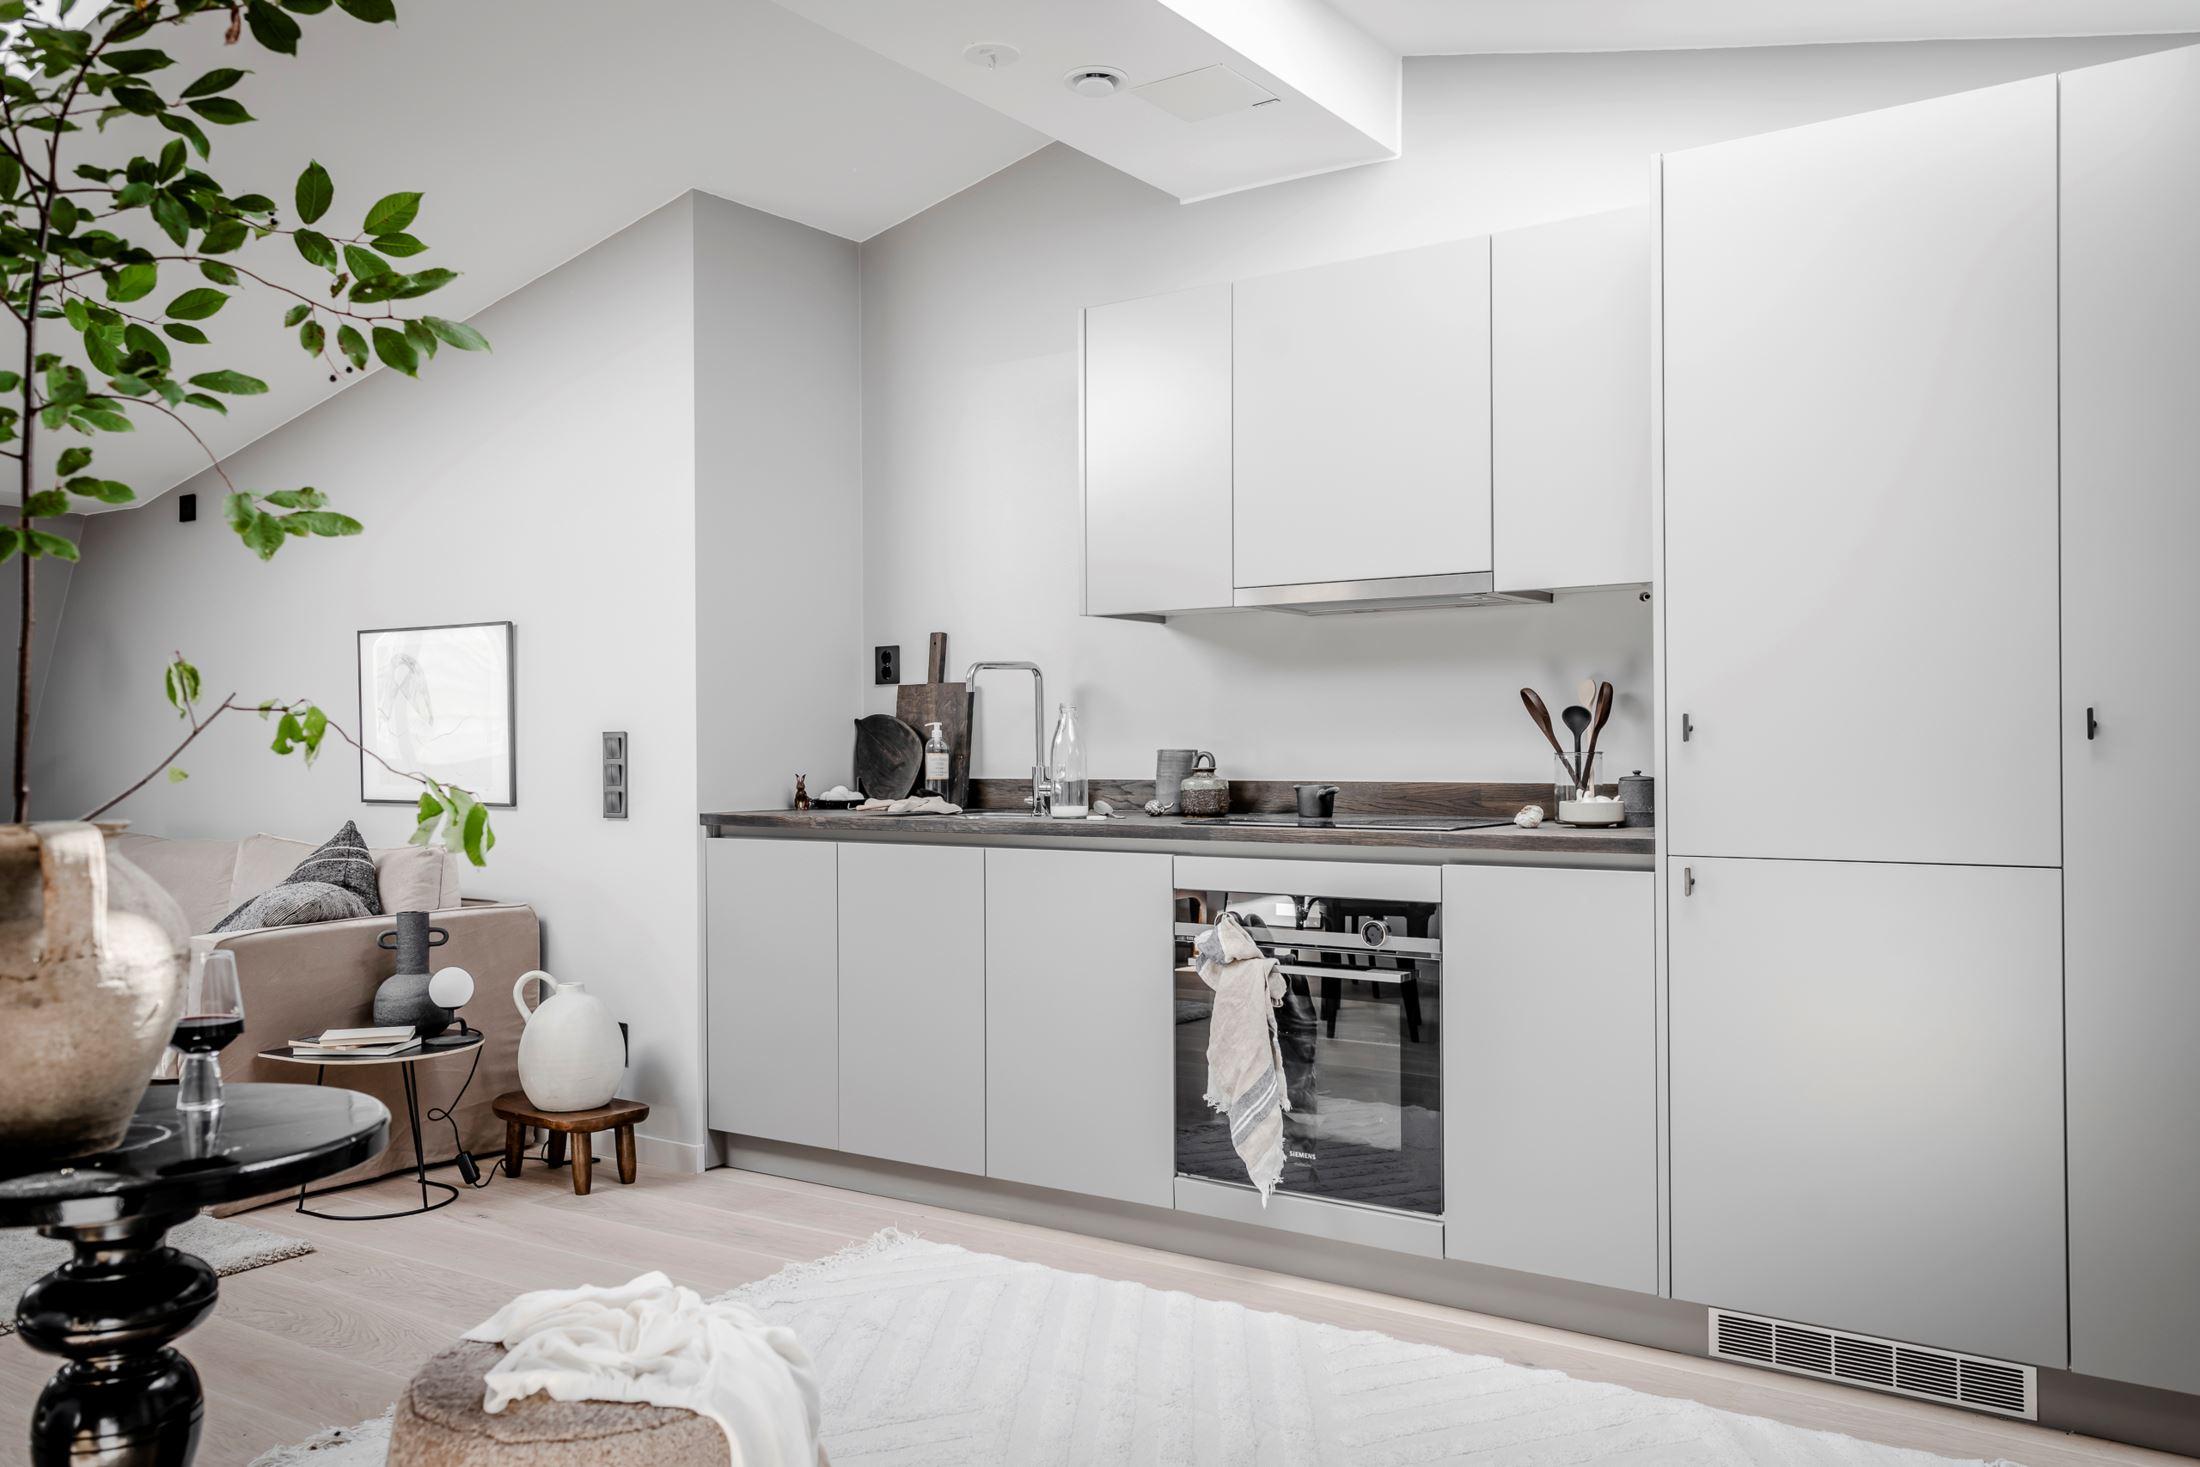 Plan deschis și decor nordic într o garsonieră la mansardă 35 m² 8